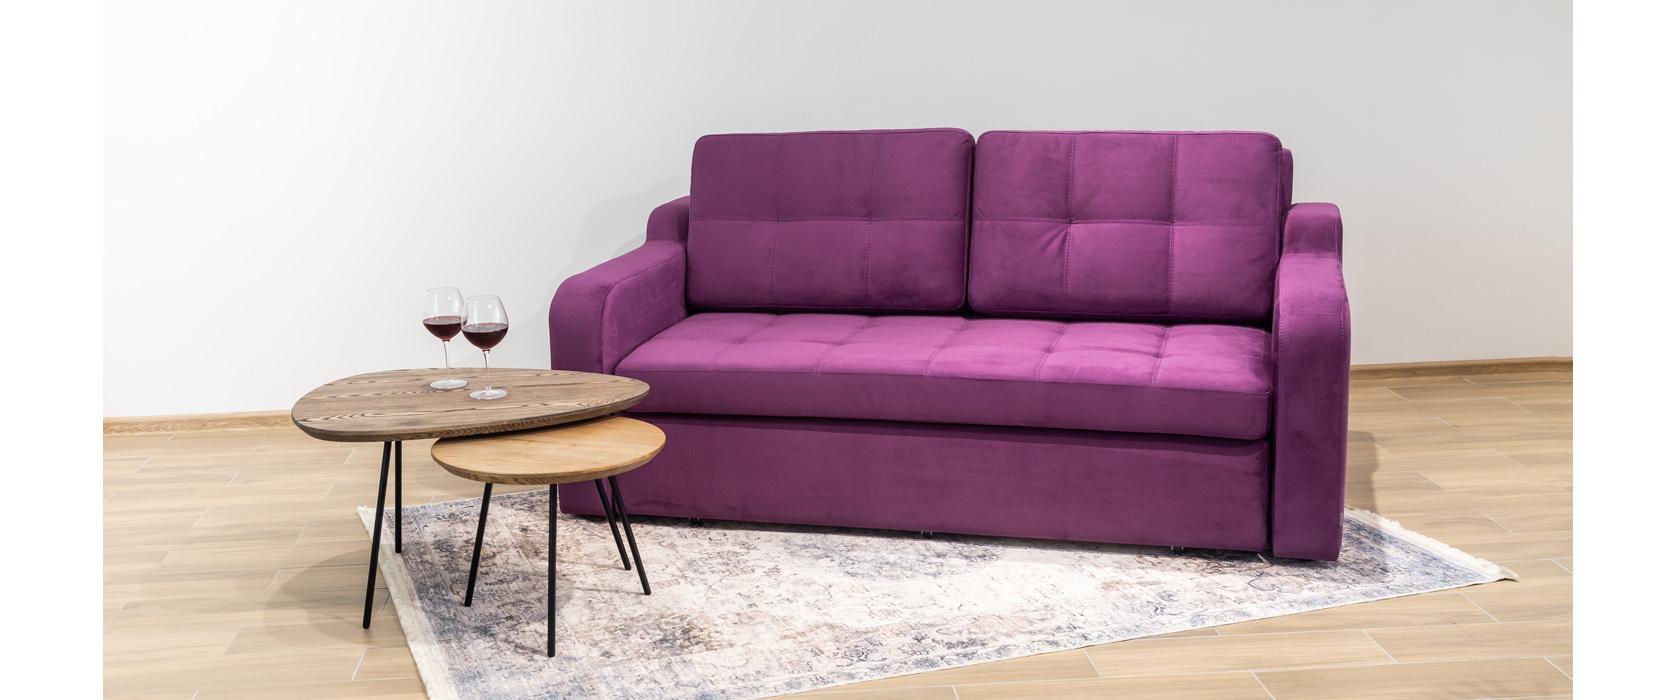 Трехместный диван Vito - Фото 2 - Pufetto